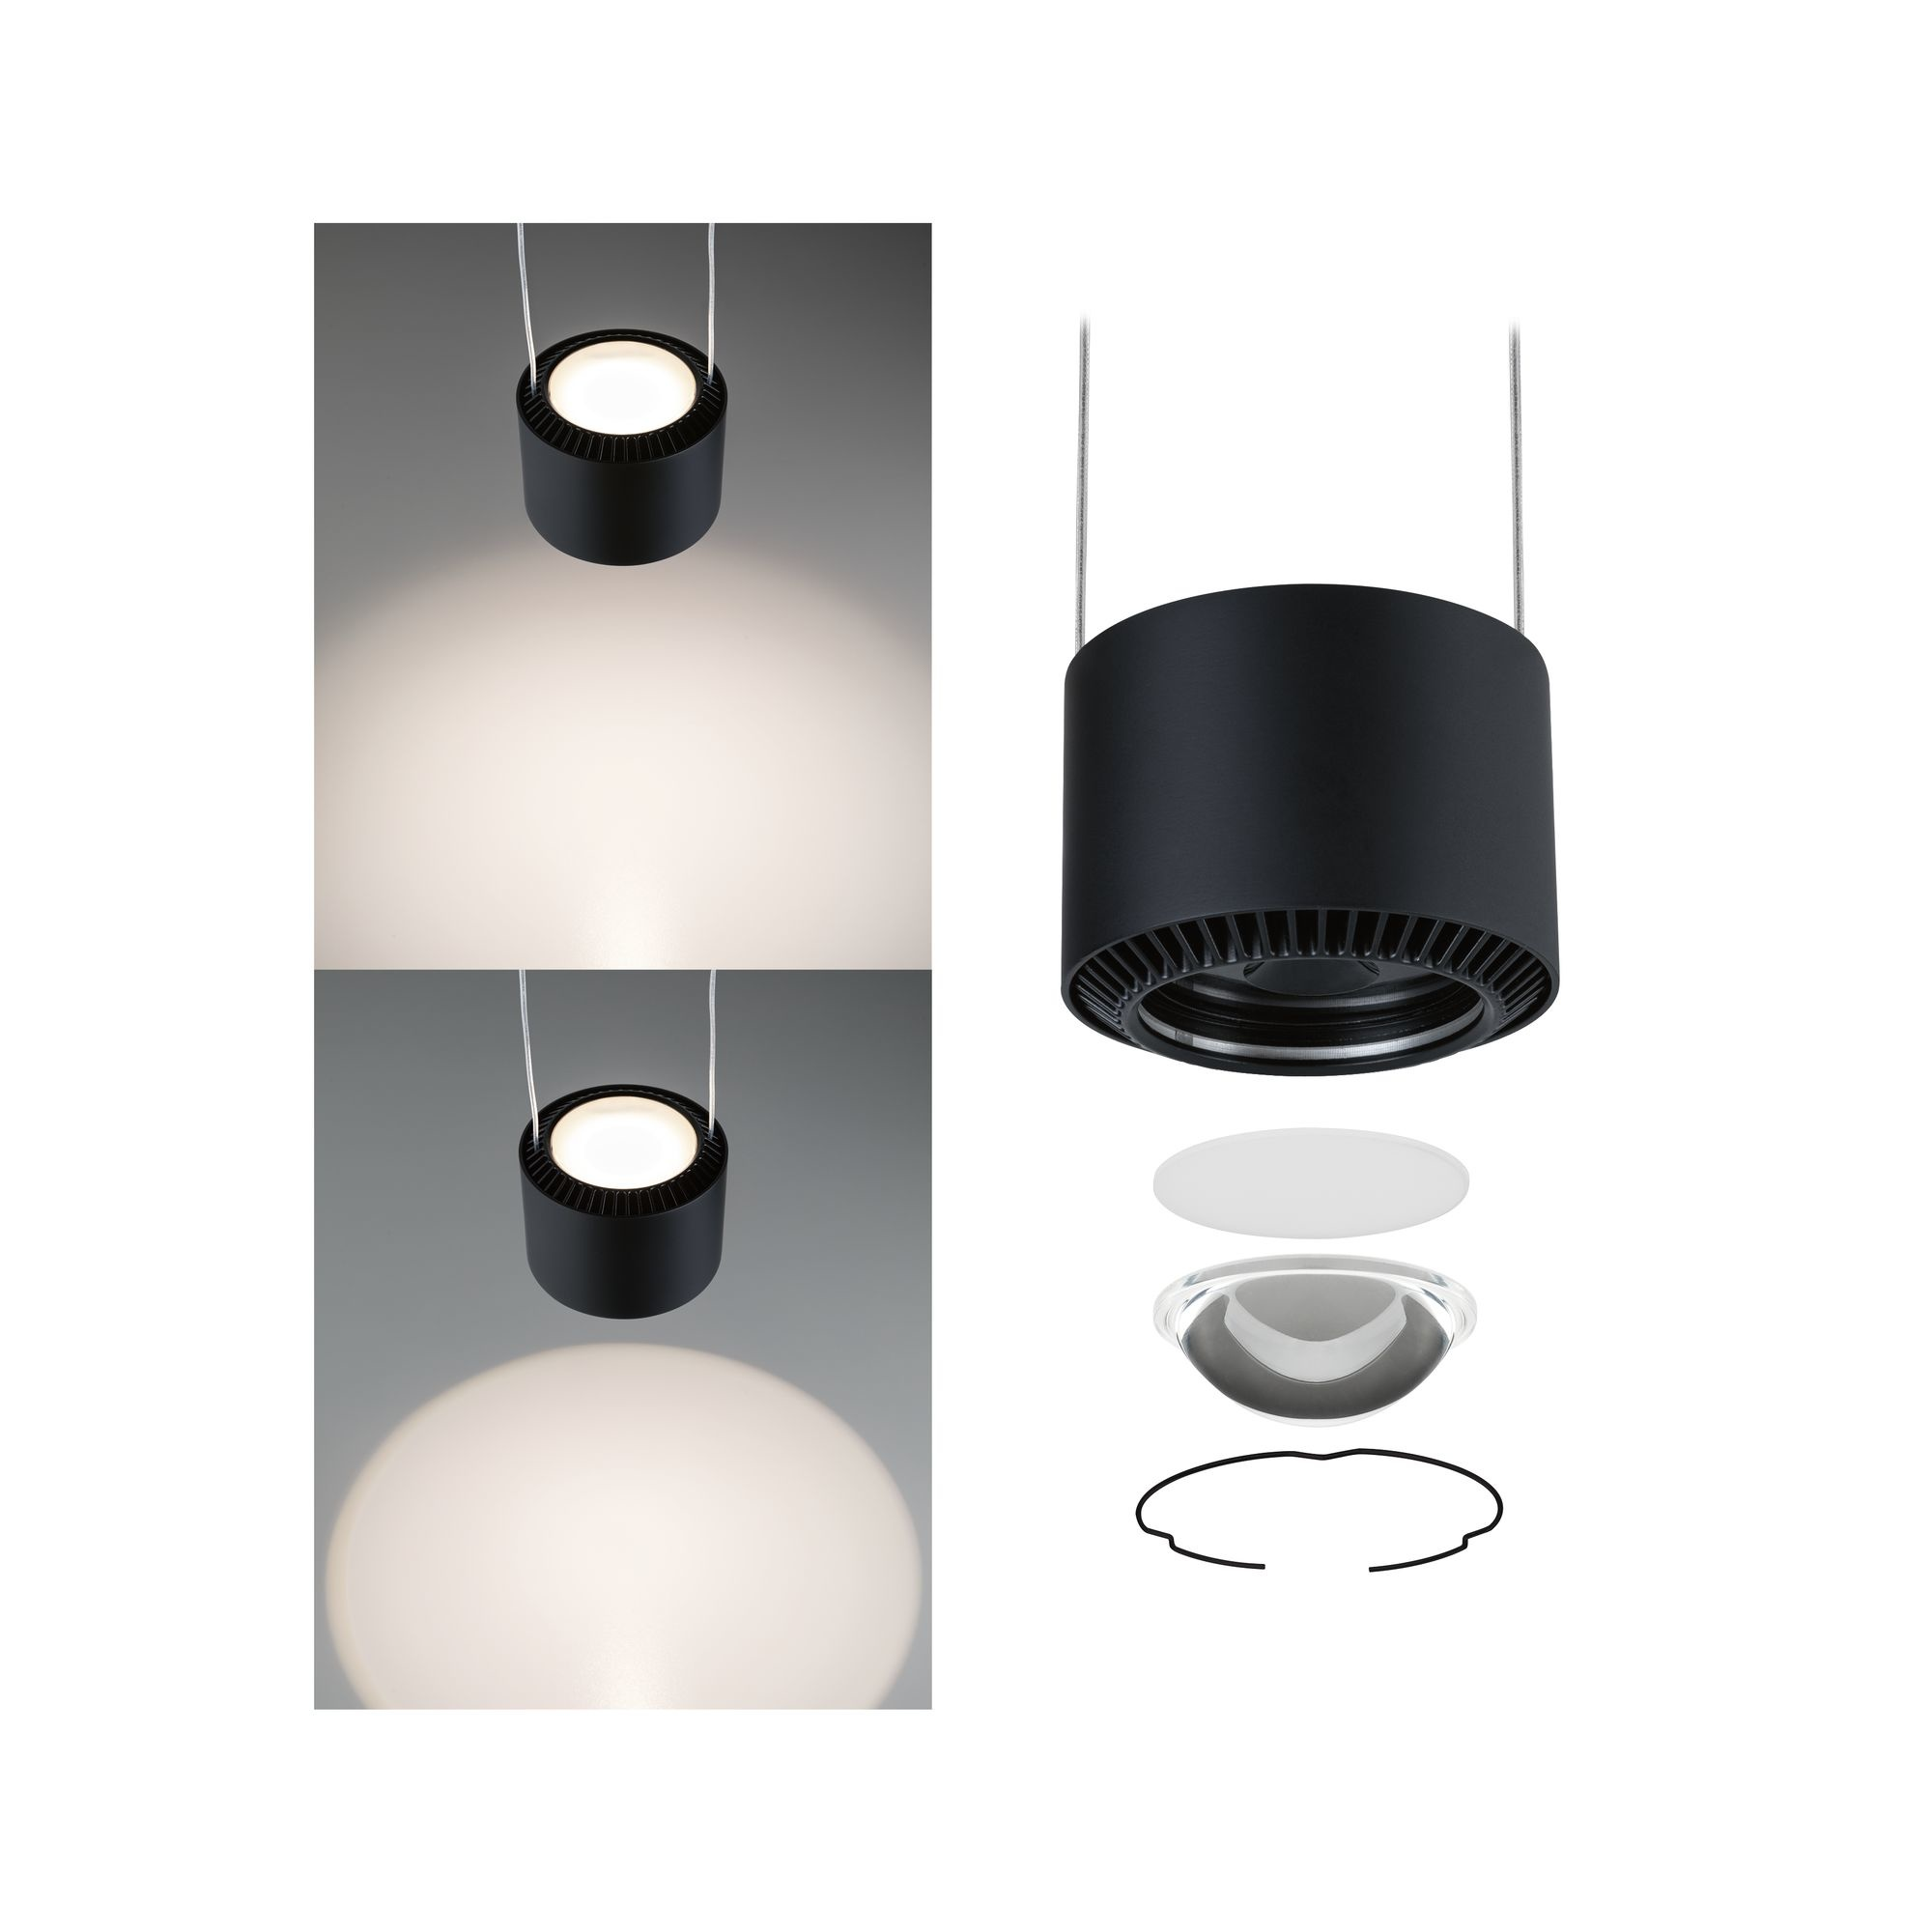 Paulmann URail LED Pendel Aldan 1-flammig 1x8,5W Schwarz matt dimmbar